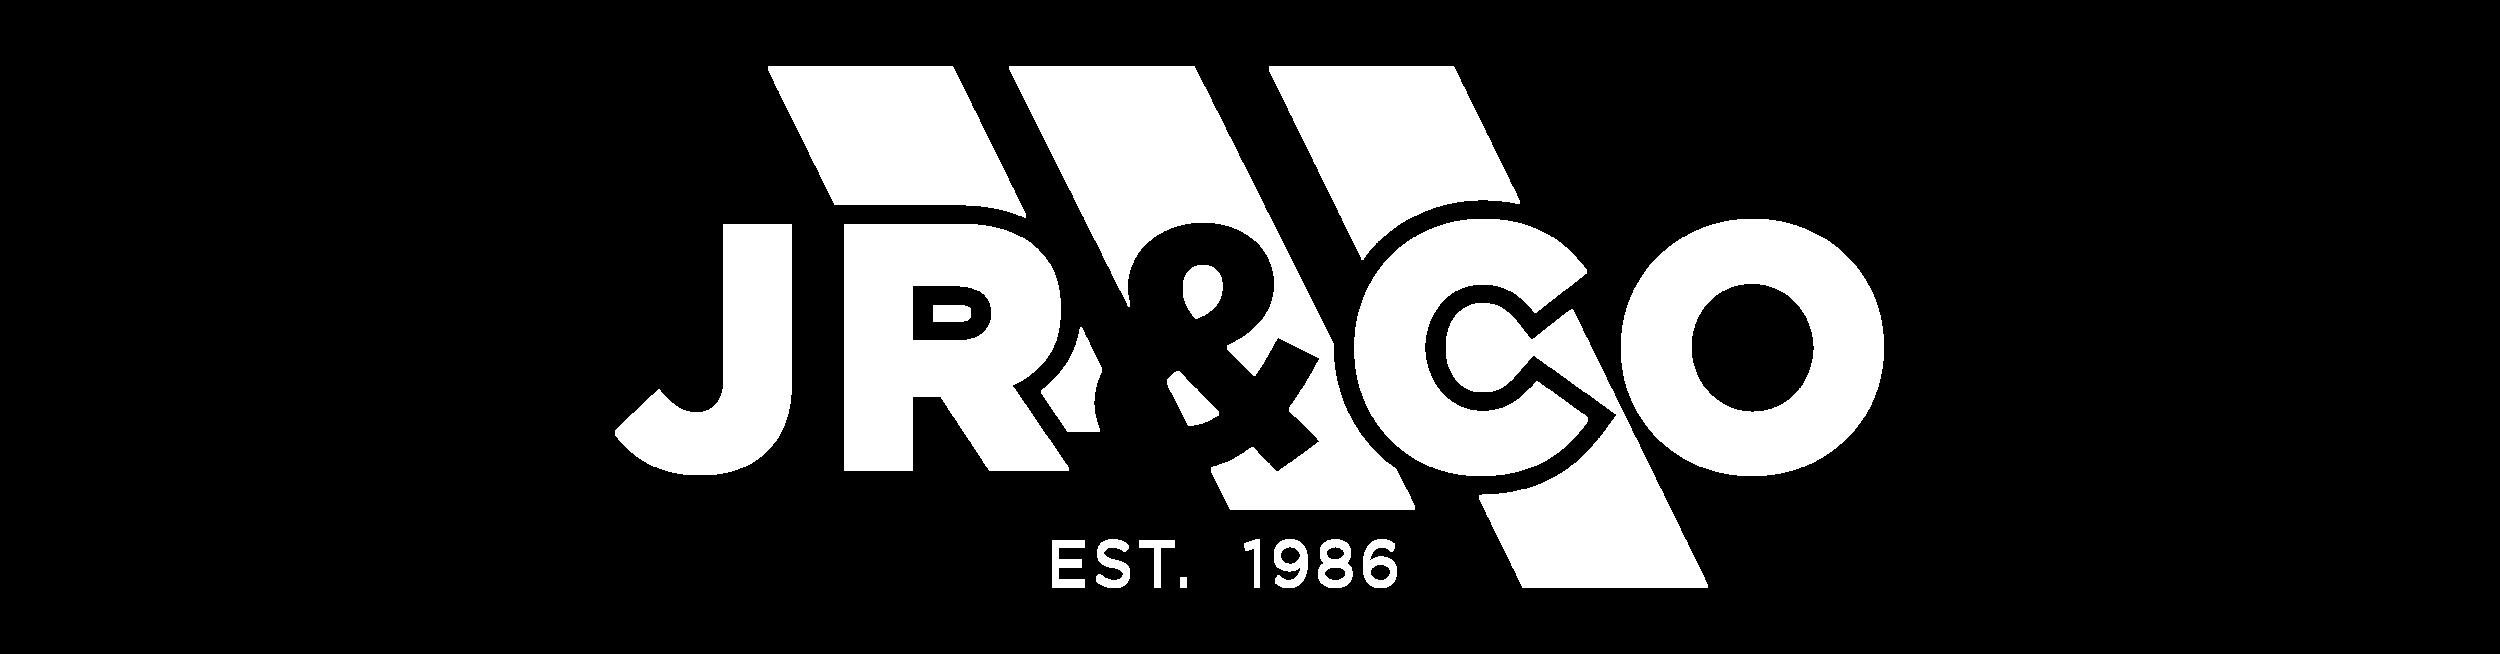 JRCO-header-logos-REG.png